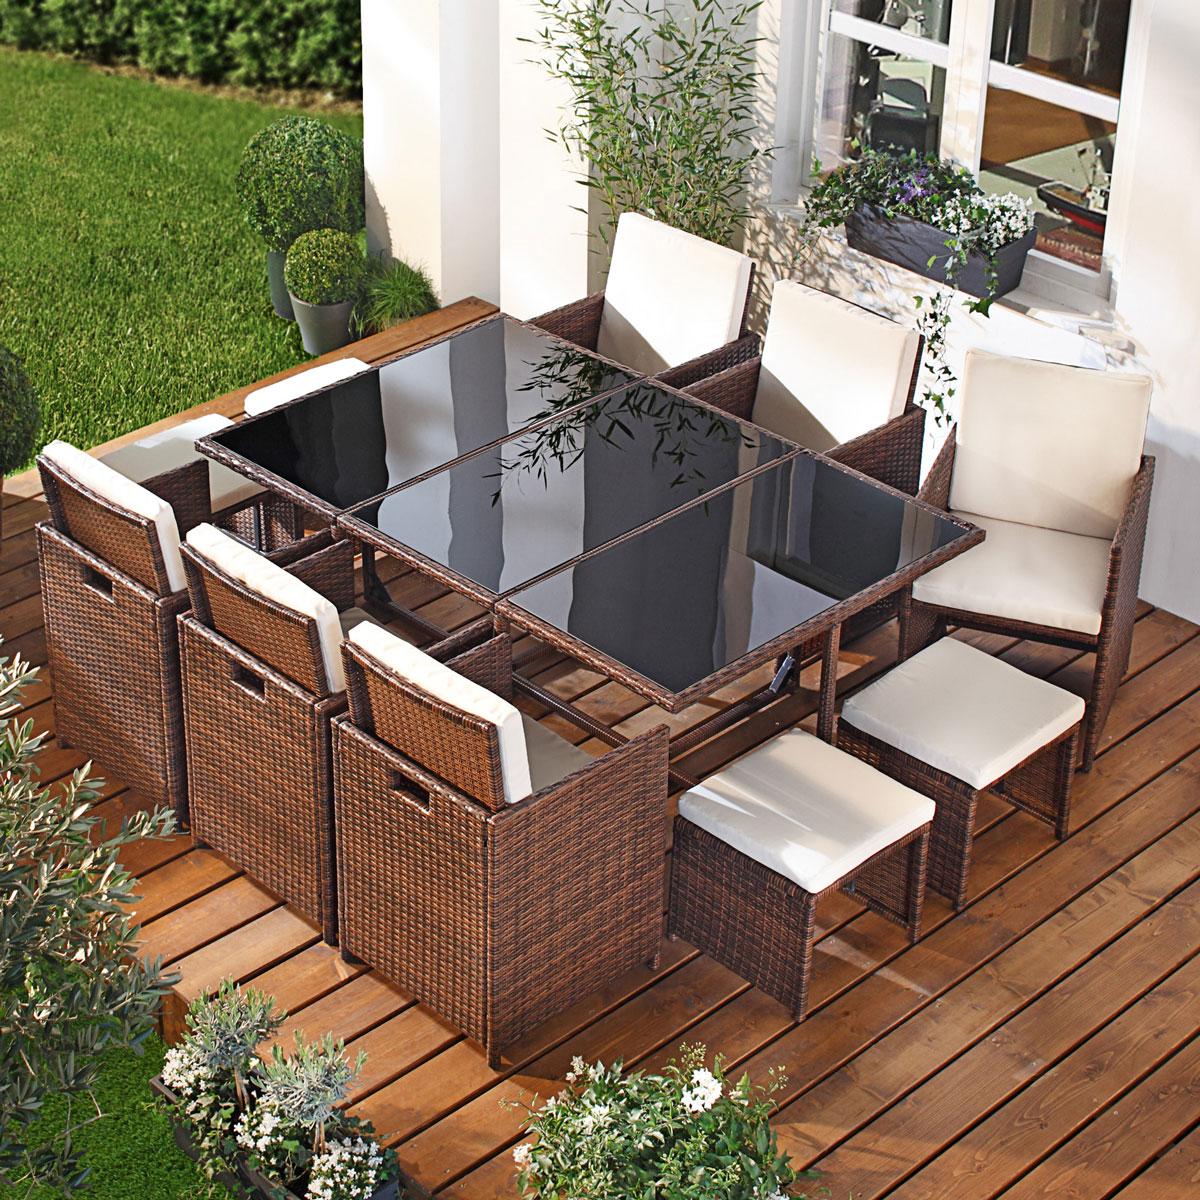 poly rattan sitzgruppe garnitur lounge gartenm bel sitzgarnitur gartengarnitur ebay. Black Bedroom Furniture Sets. Home Design Ideas